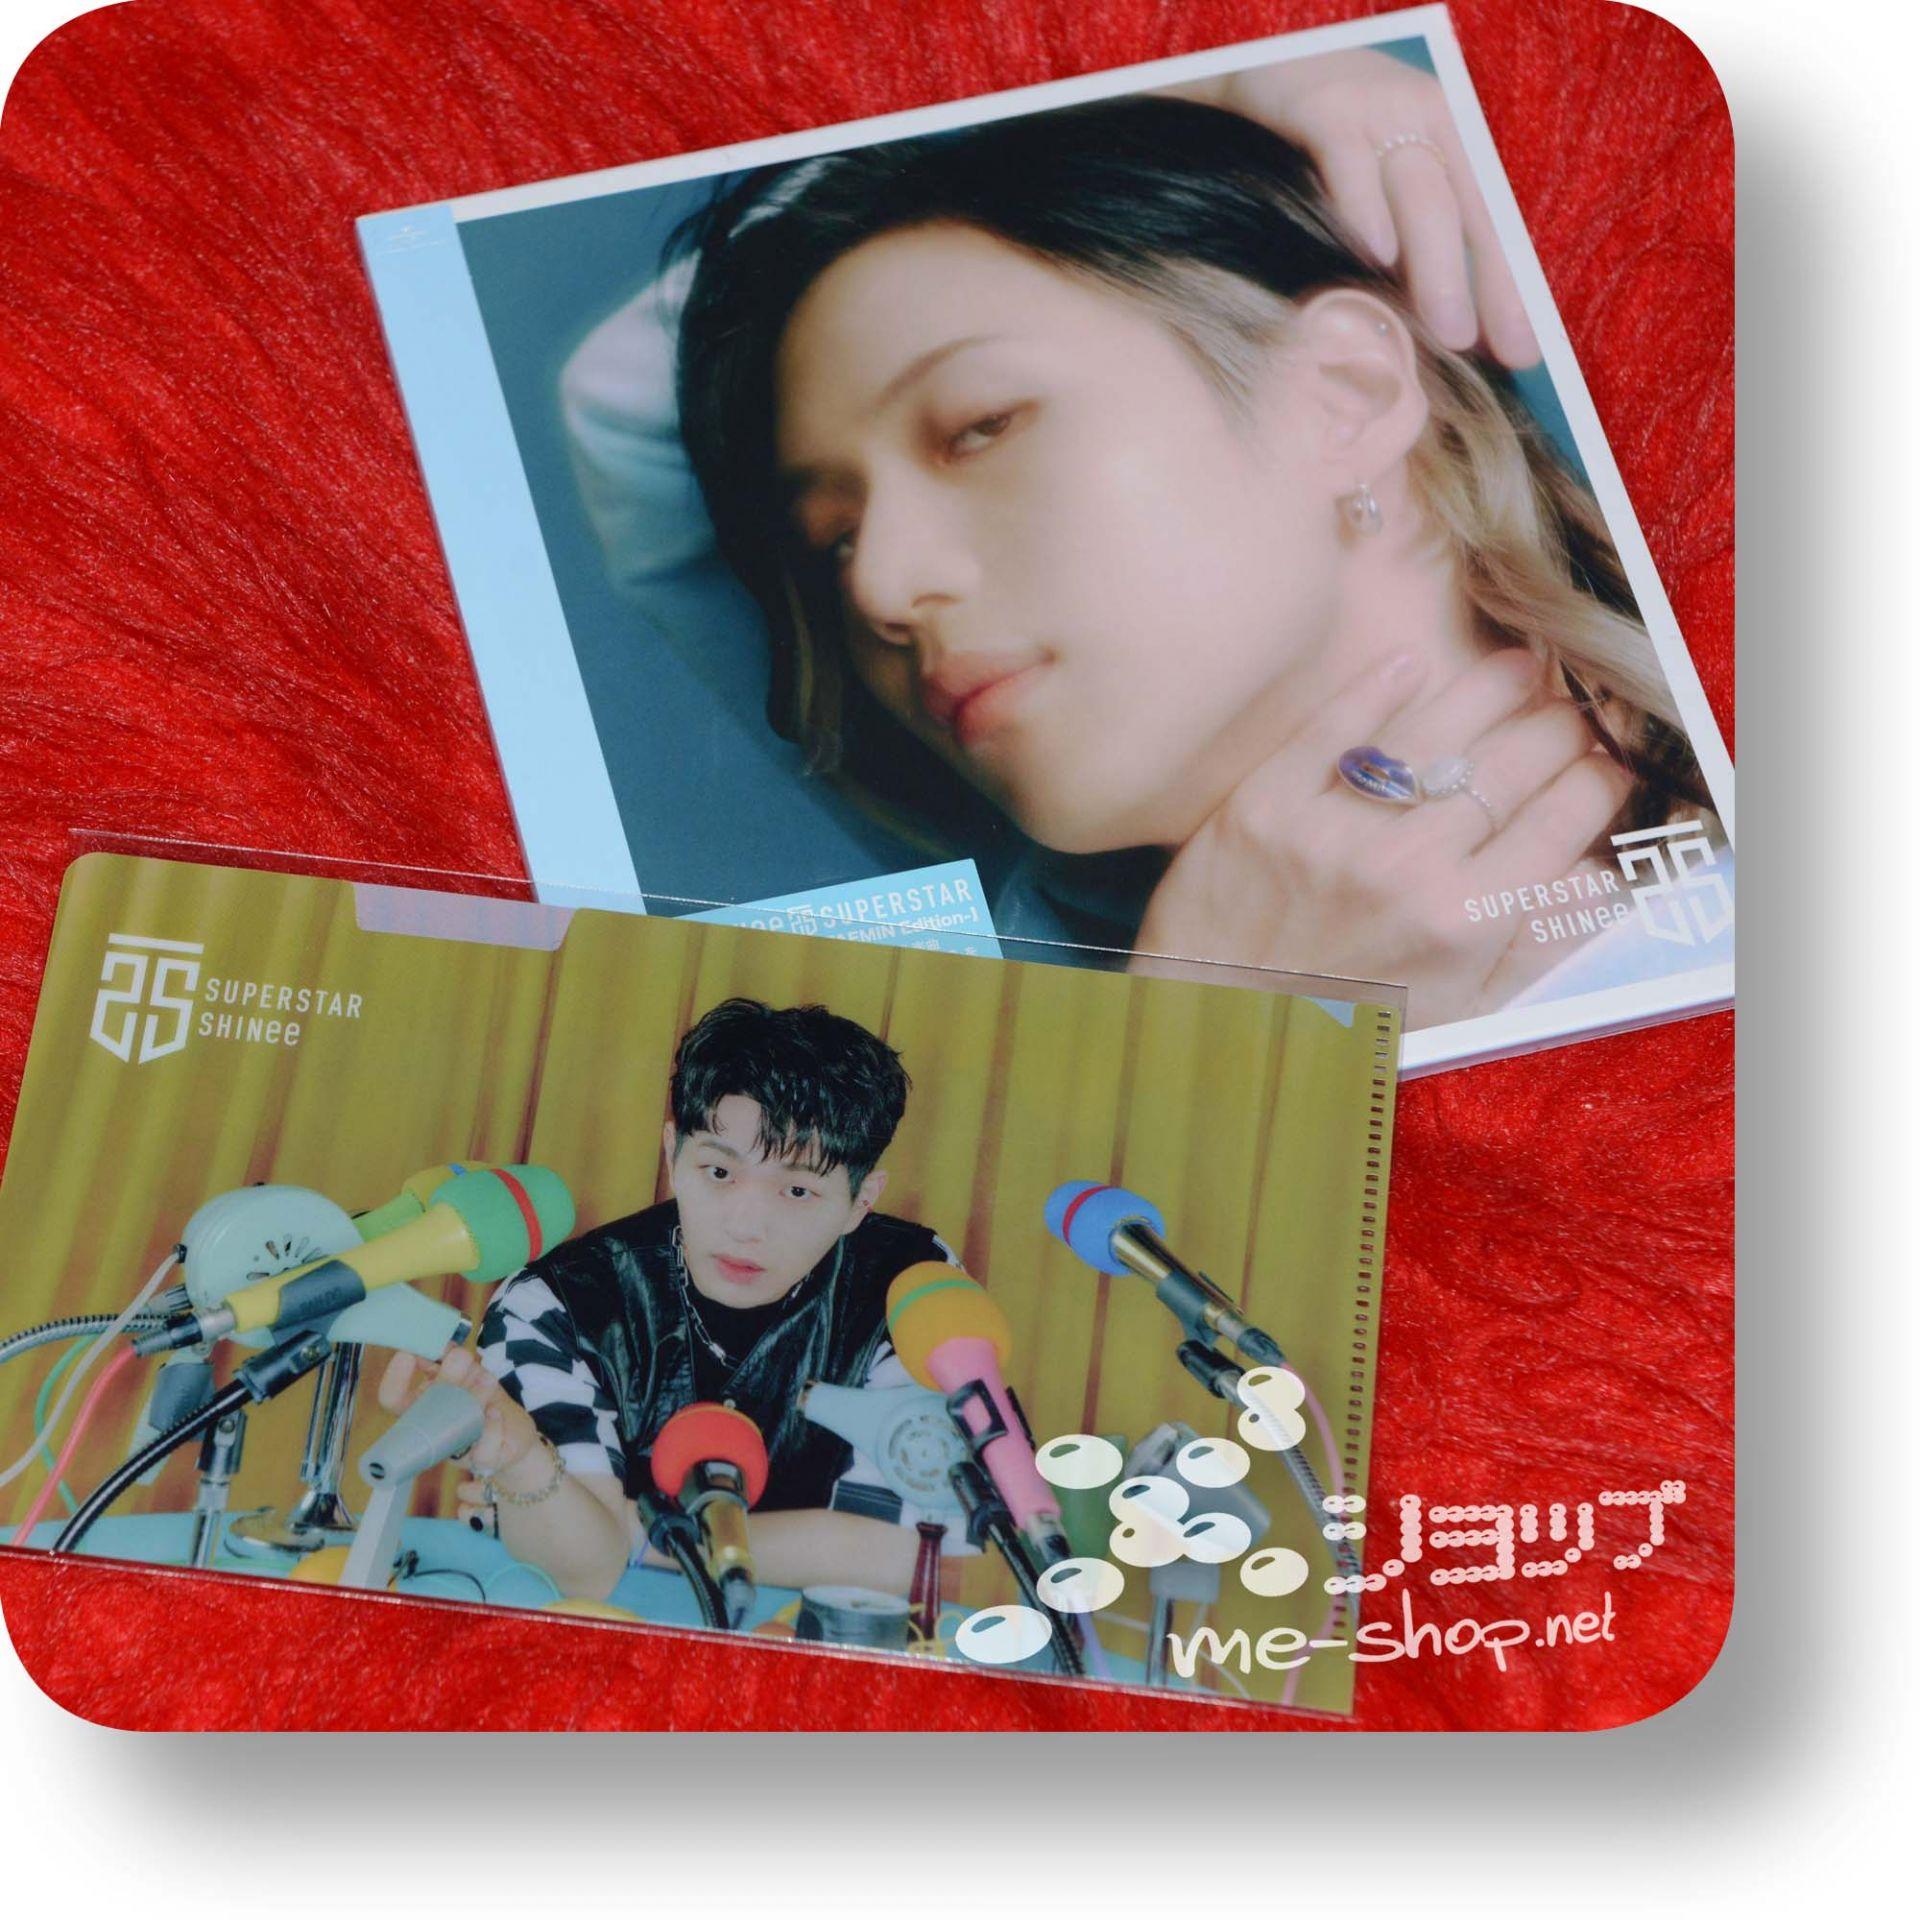 shinee superstar taemin+bonus